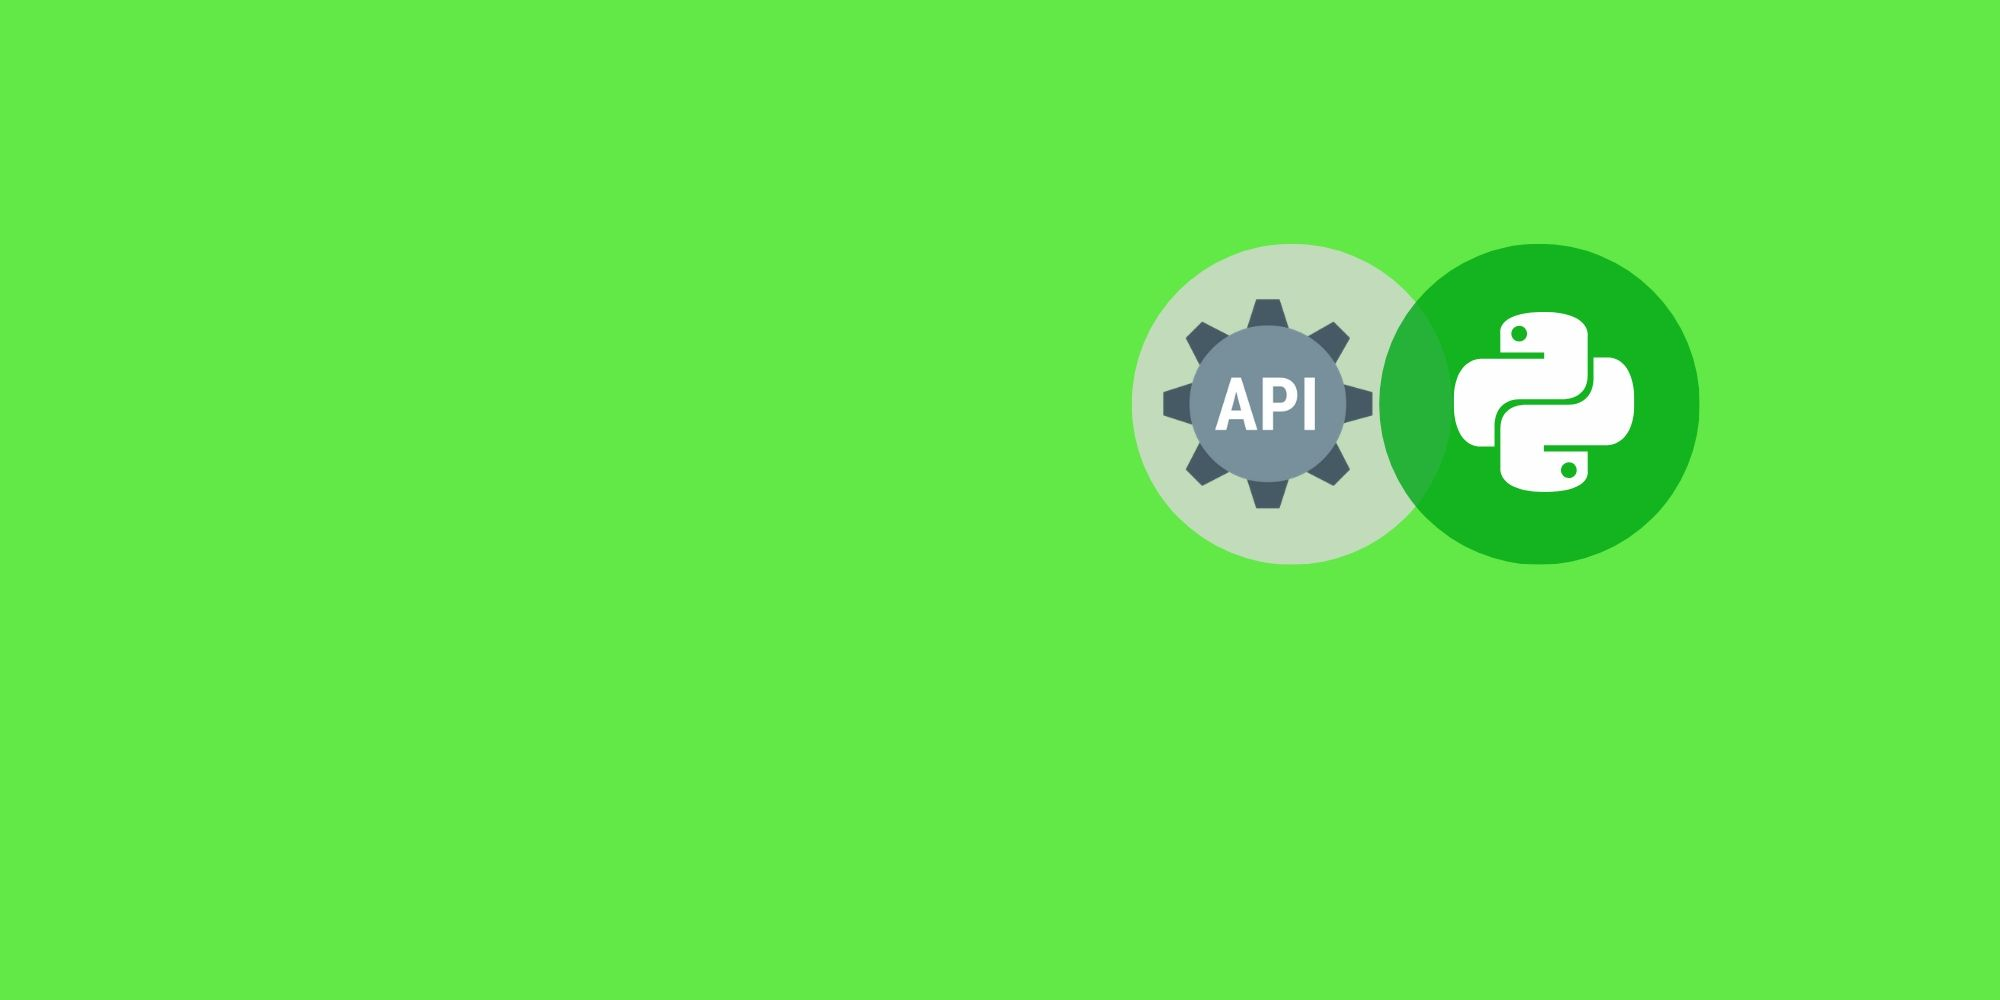 api-testing-with-python-training